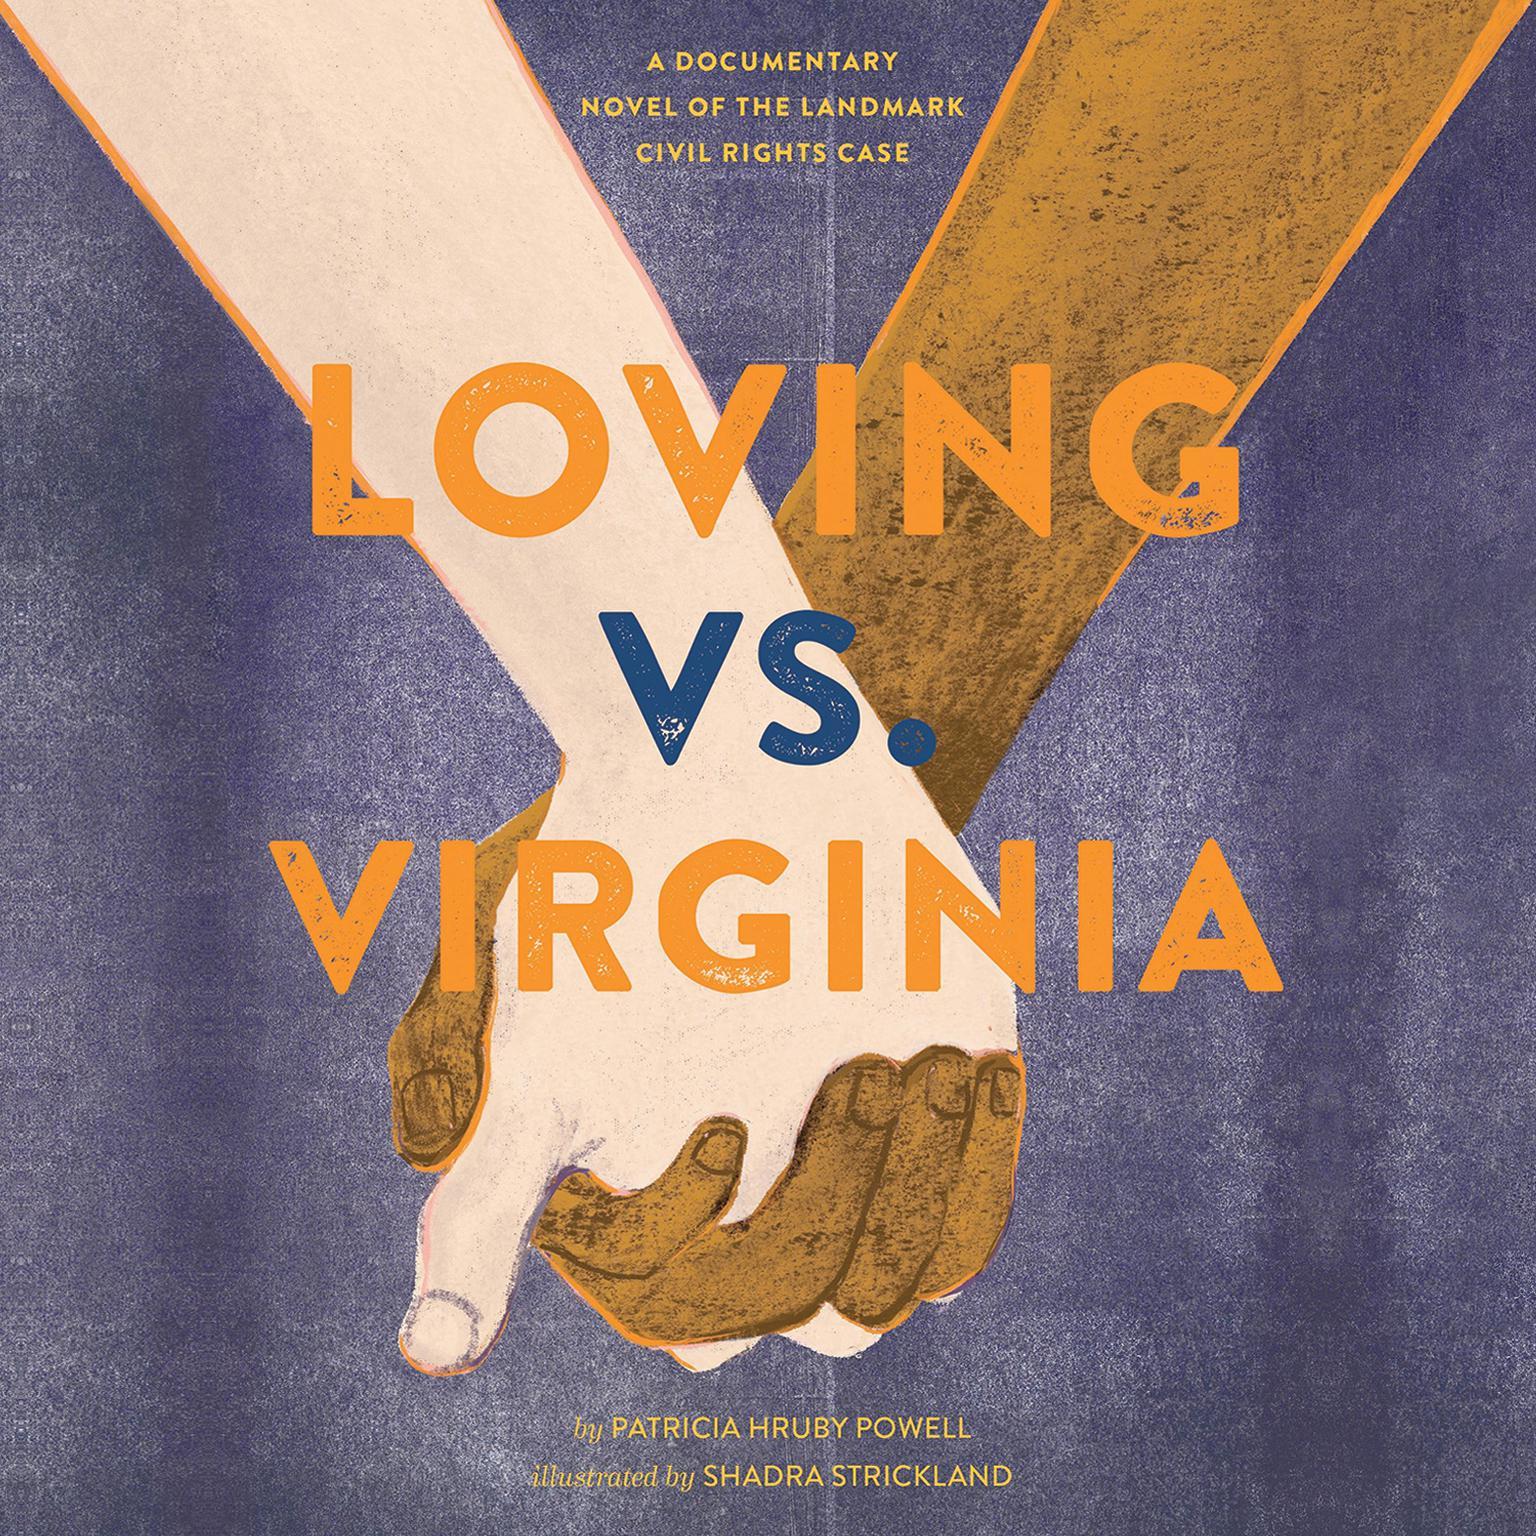 Loving vs. Virginia: A Documentary Novel of the Landmark Civil Rights Case Audiobook, by Patricia Hruby Powell